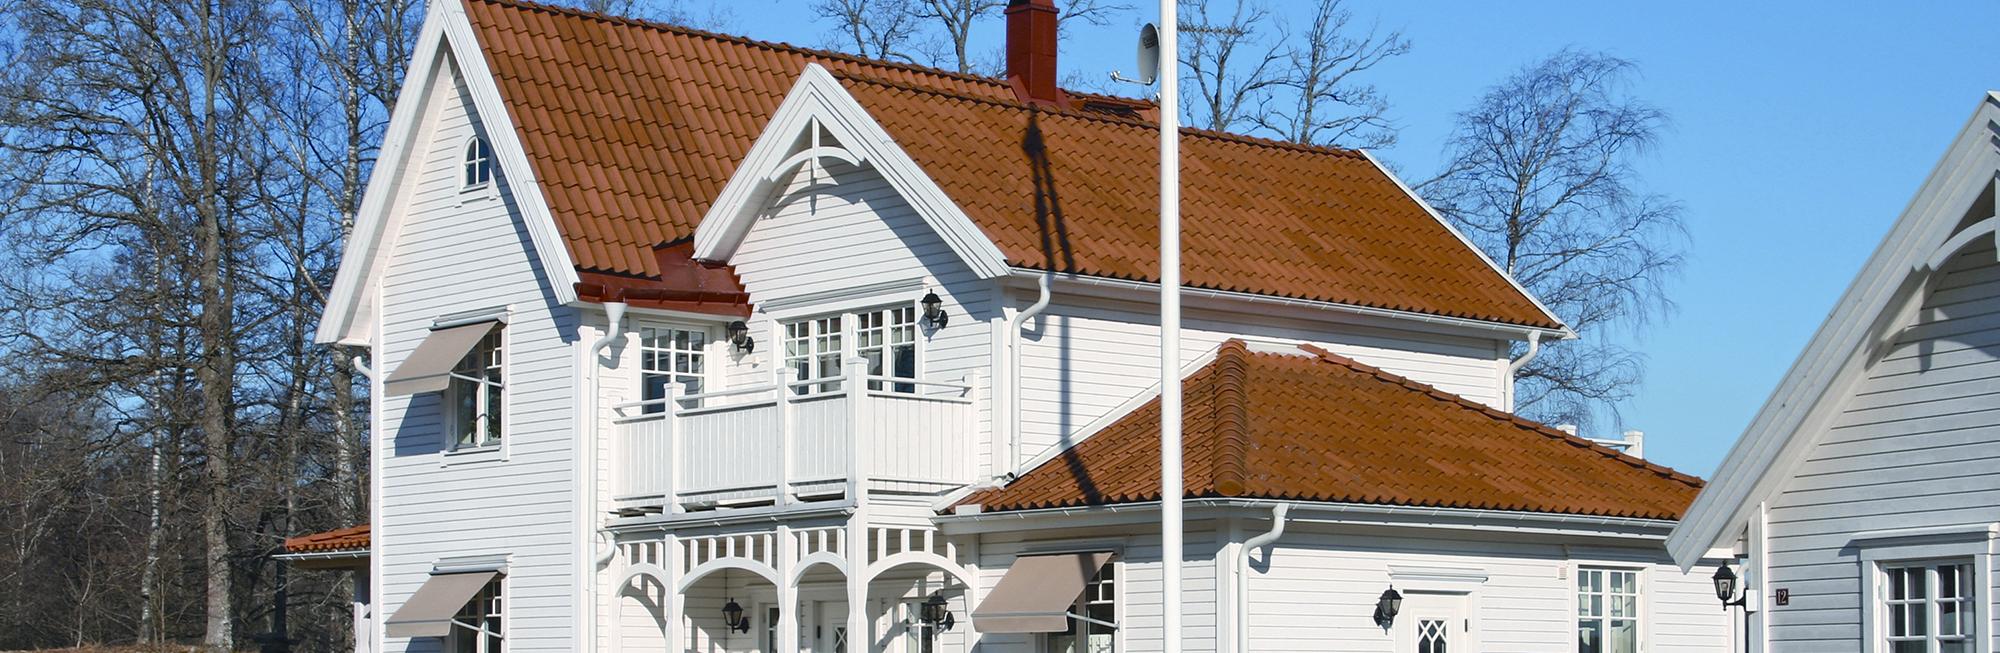 Stora Lusthuset Torsjö